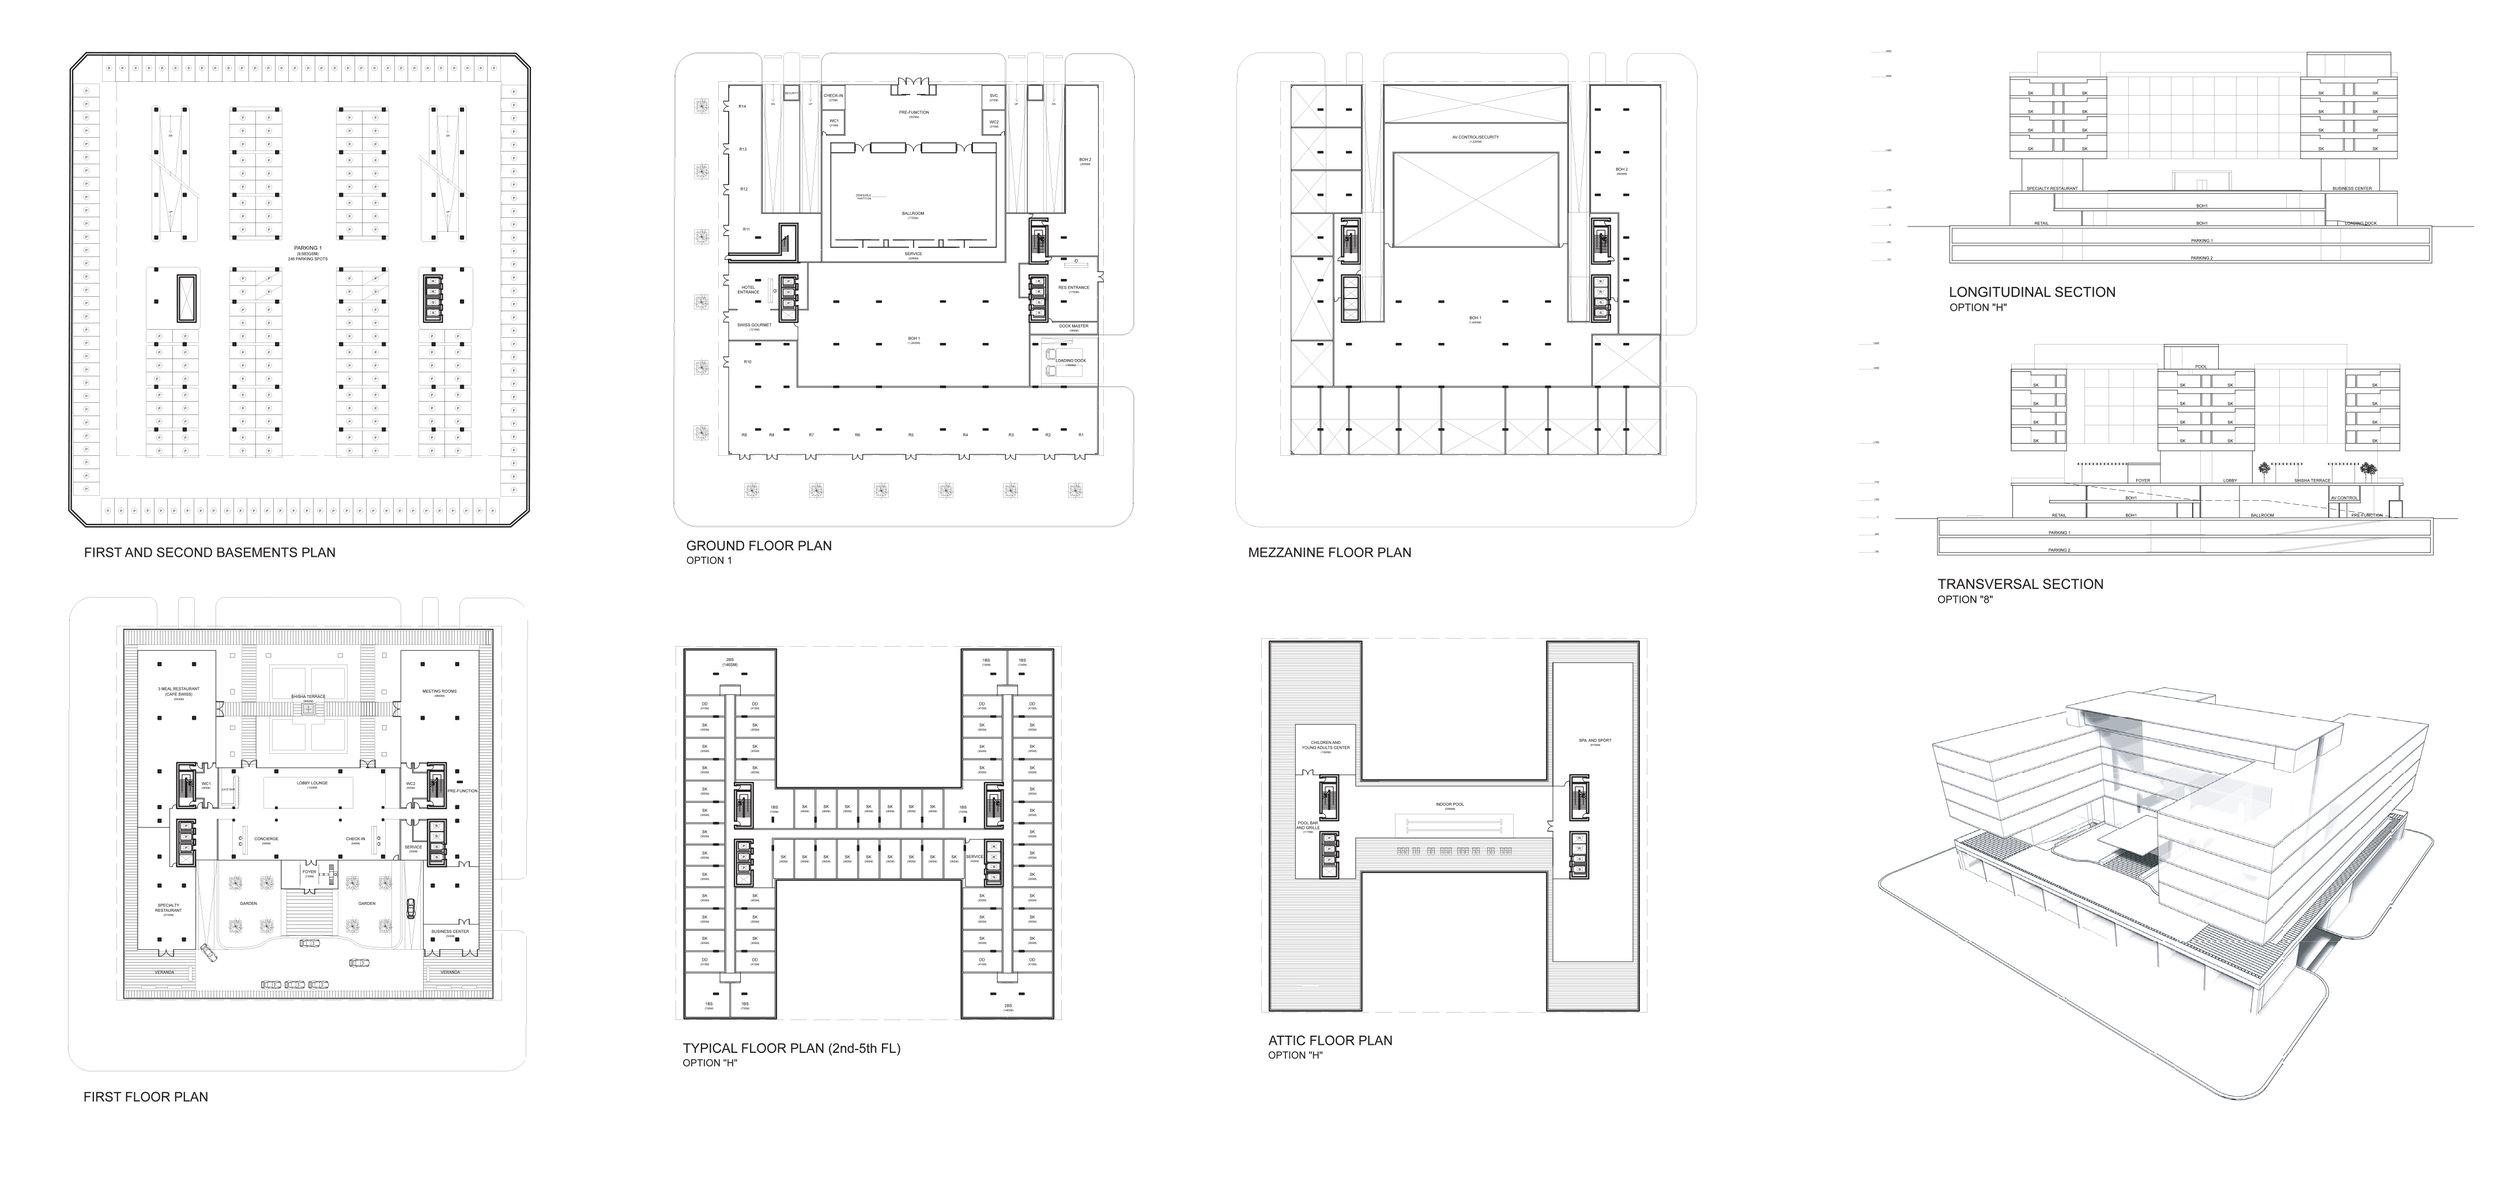 Cereal Hotel Plans.jpg